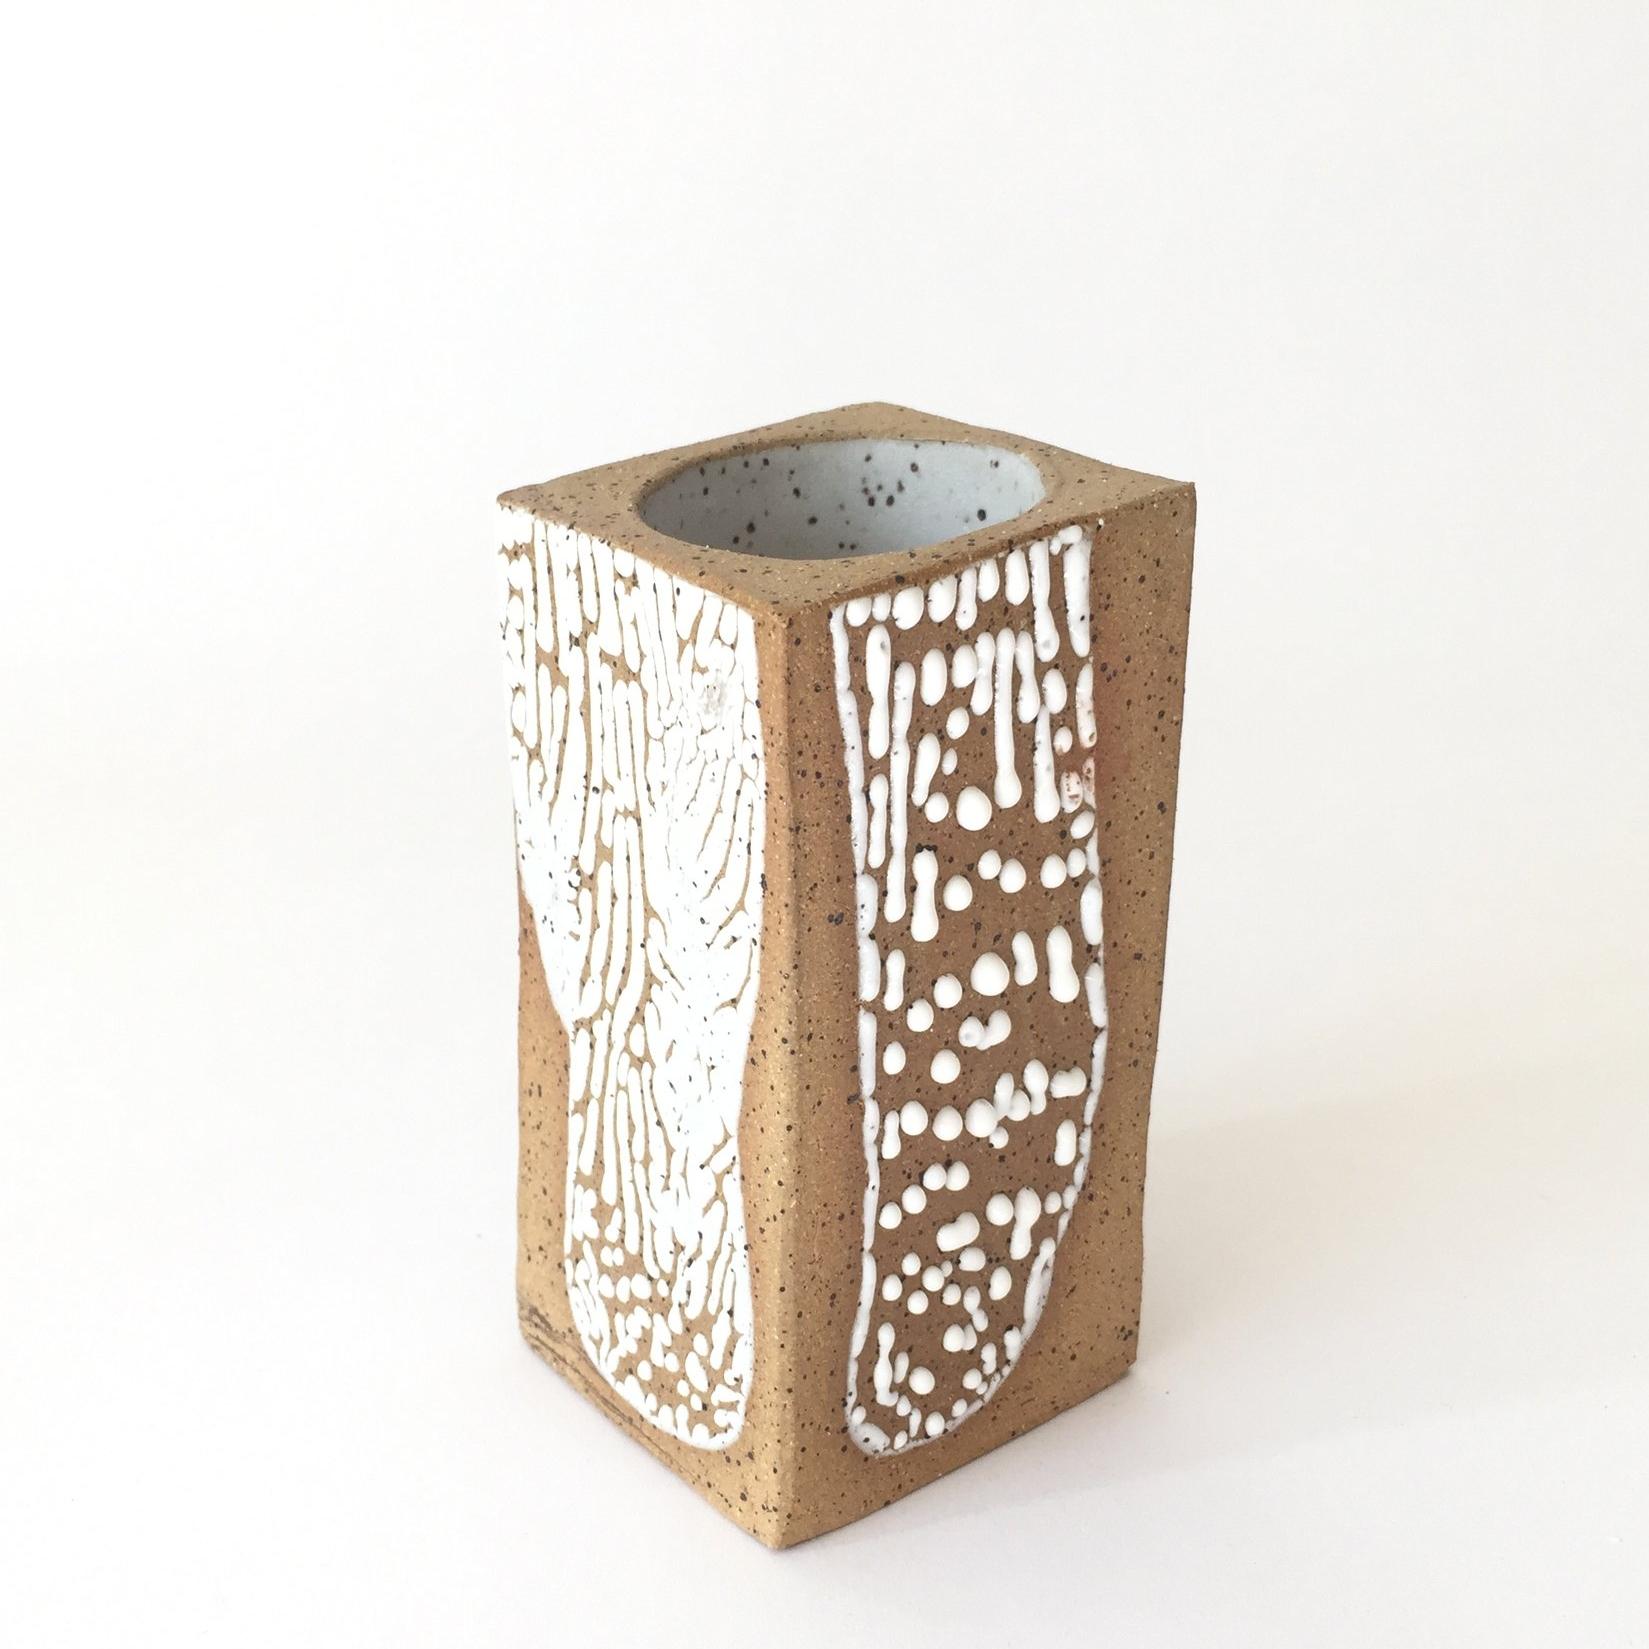 "Peninsula Small  Glaze on speckled stoneware. 4""H x 2.5""W x 2.5"" Wholesale 16"